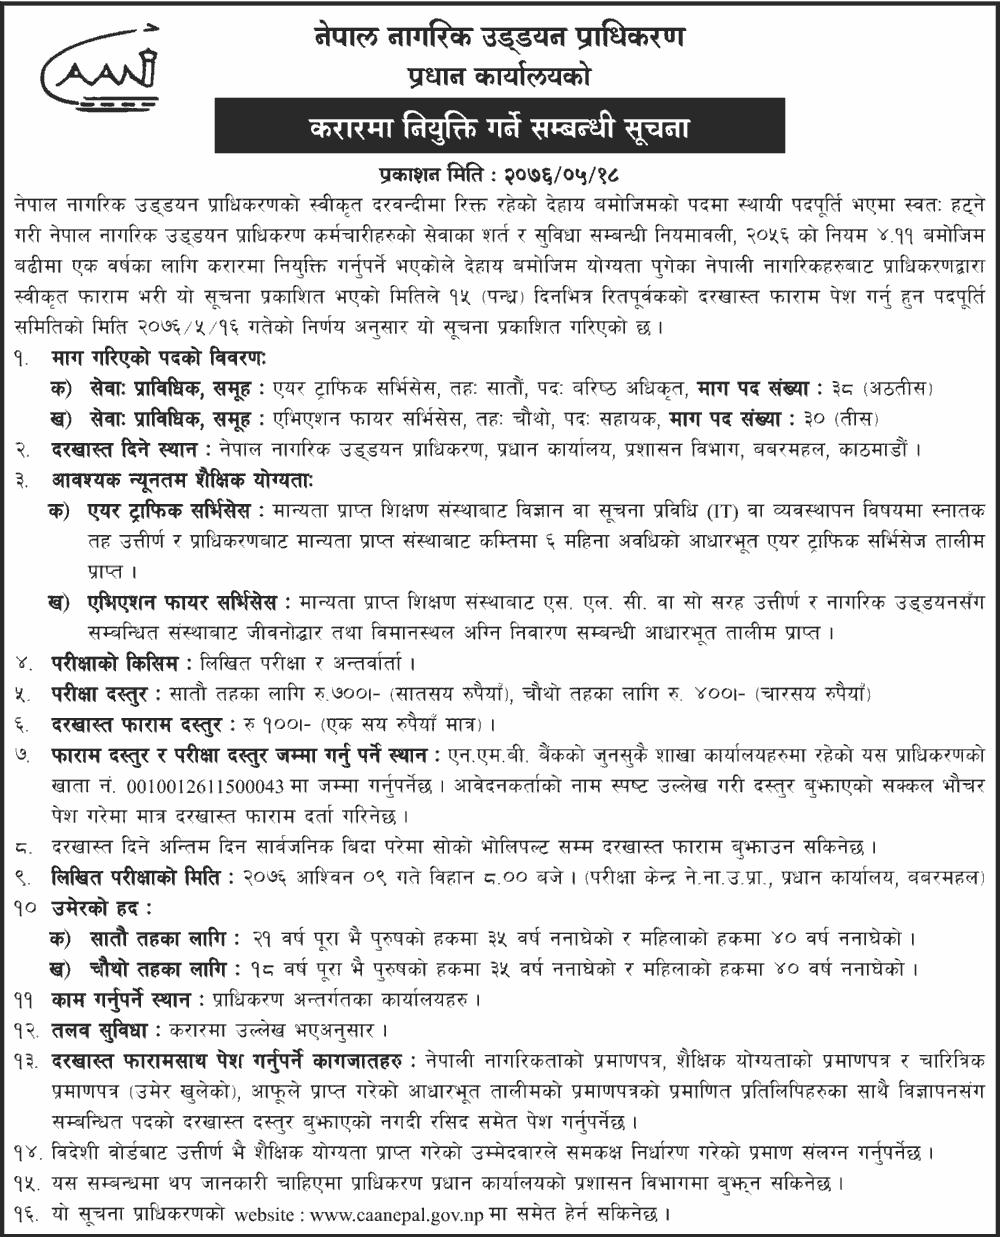 Civil Aviation Authority of Nepal Job Vacancy